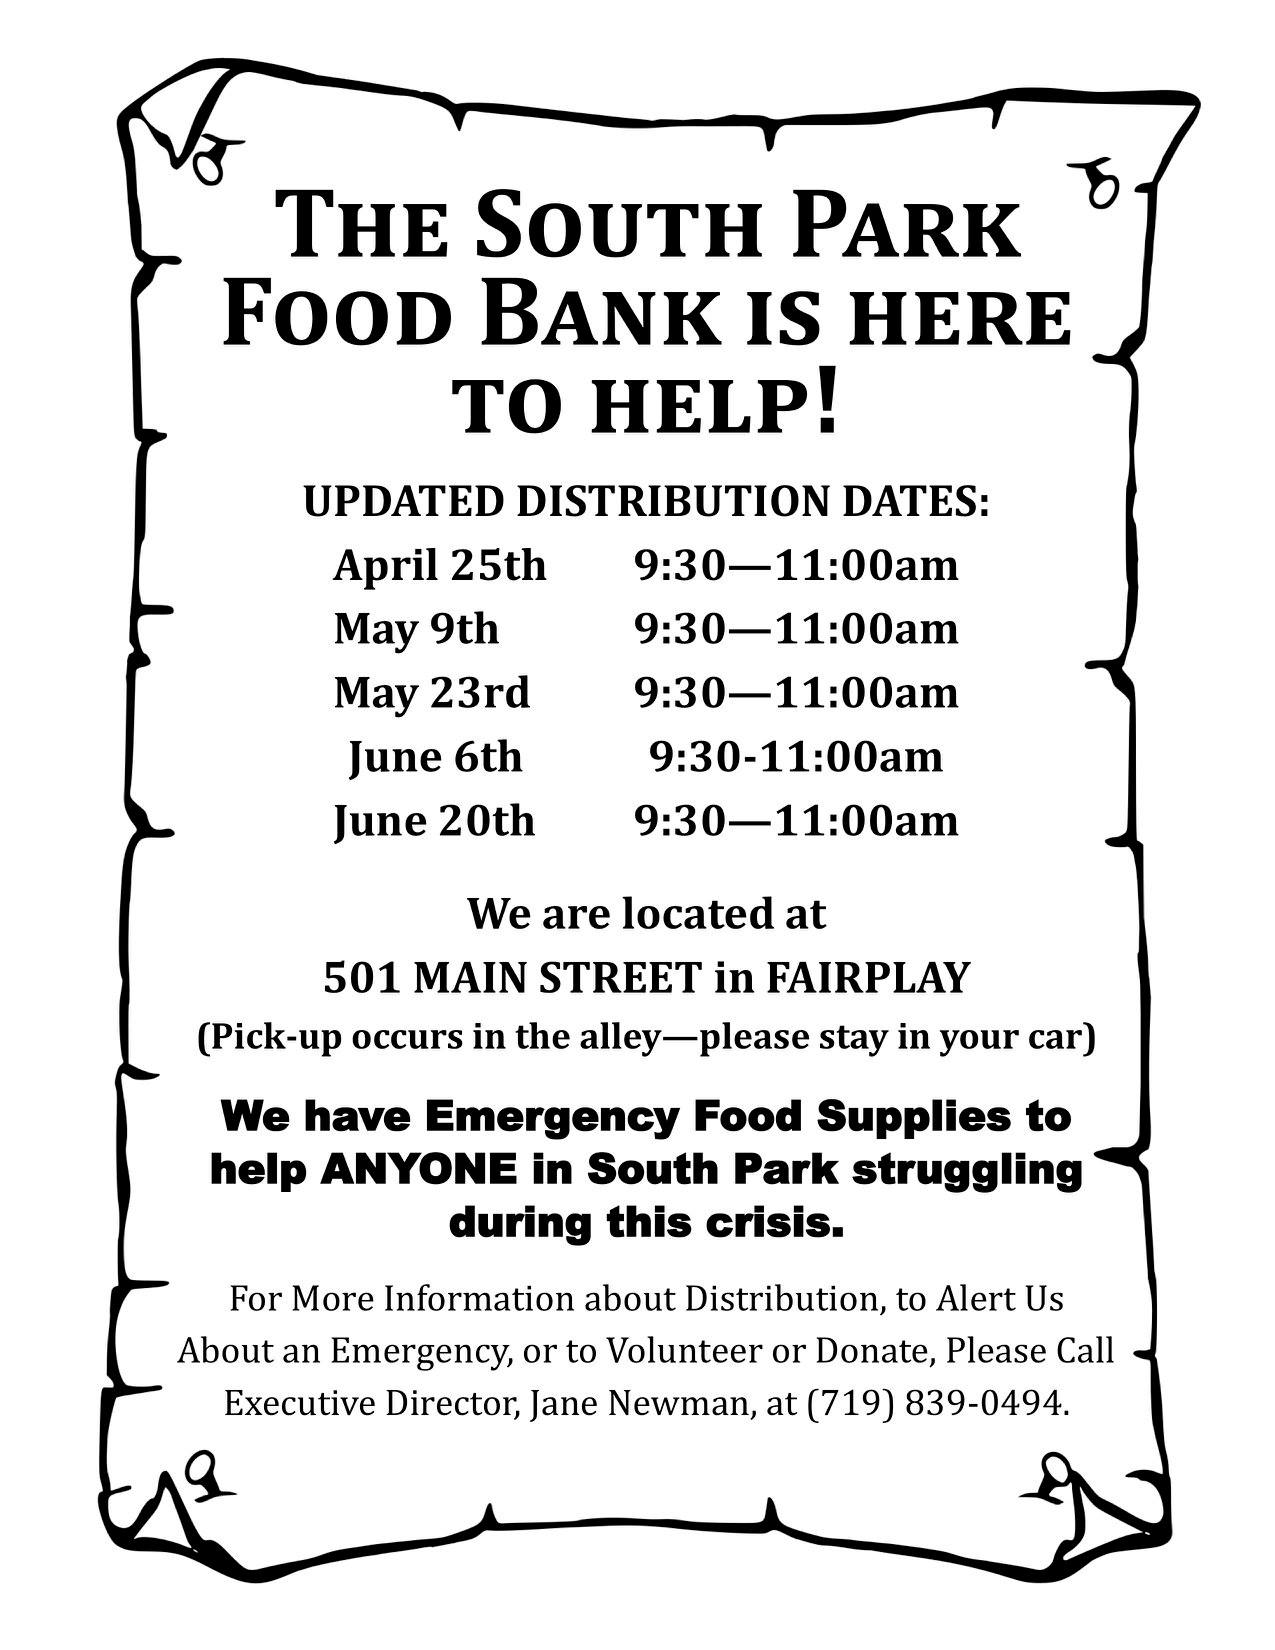 Food Bank Hours May-June 2020